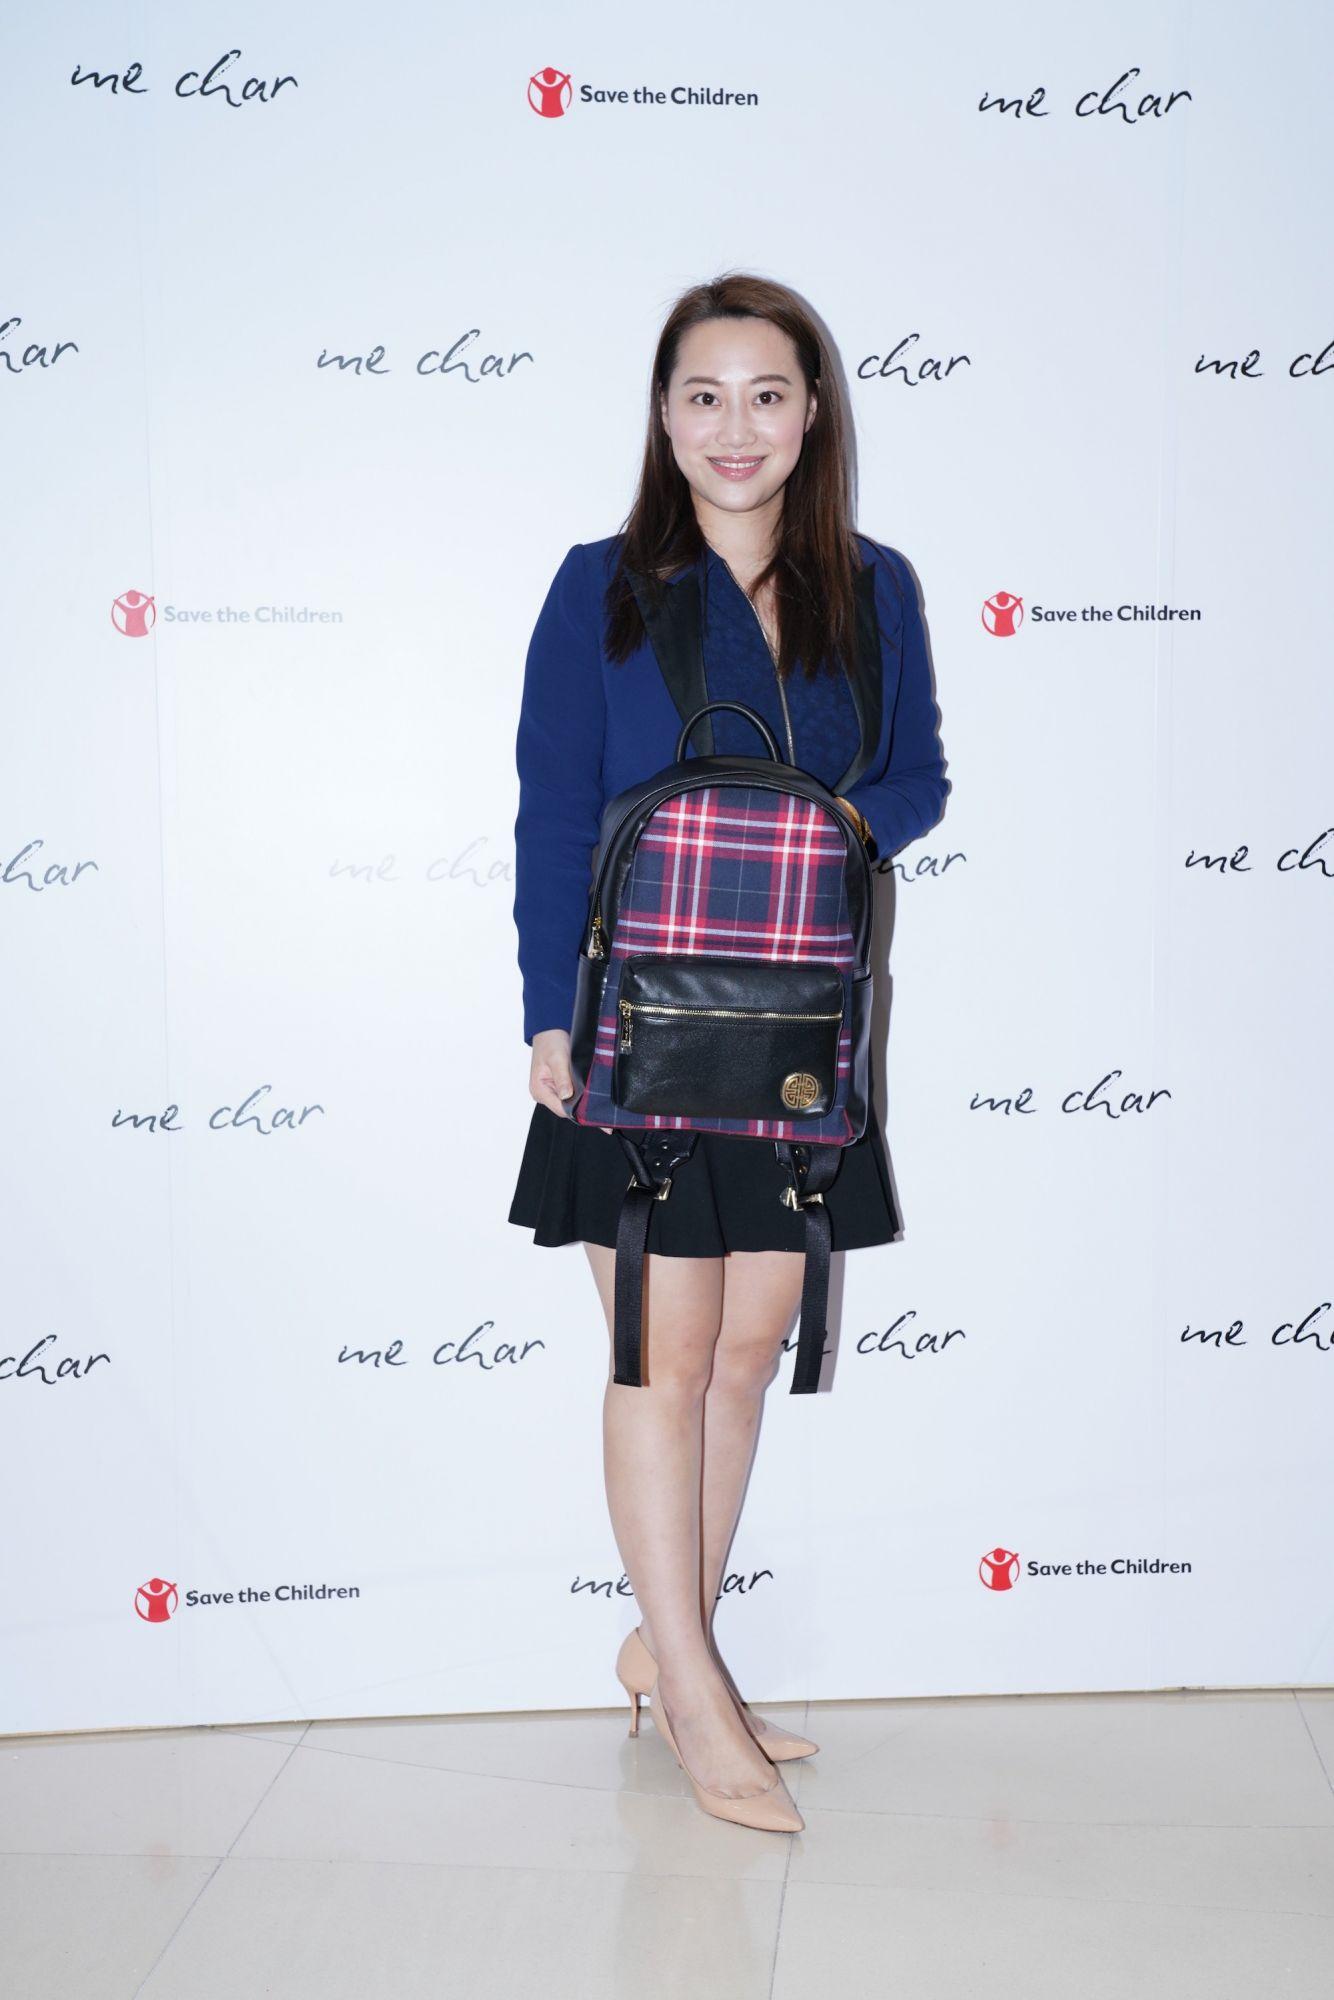 Josephine Chiu